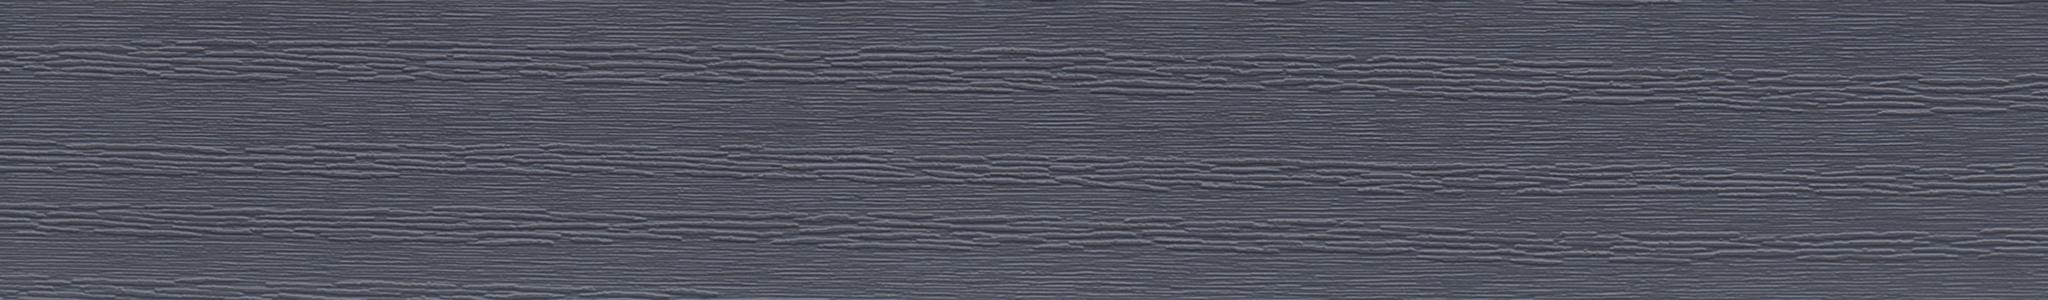 HU 172961 ABS Edge Grey Pore 109